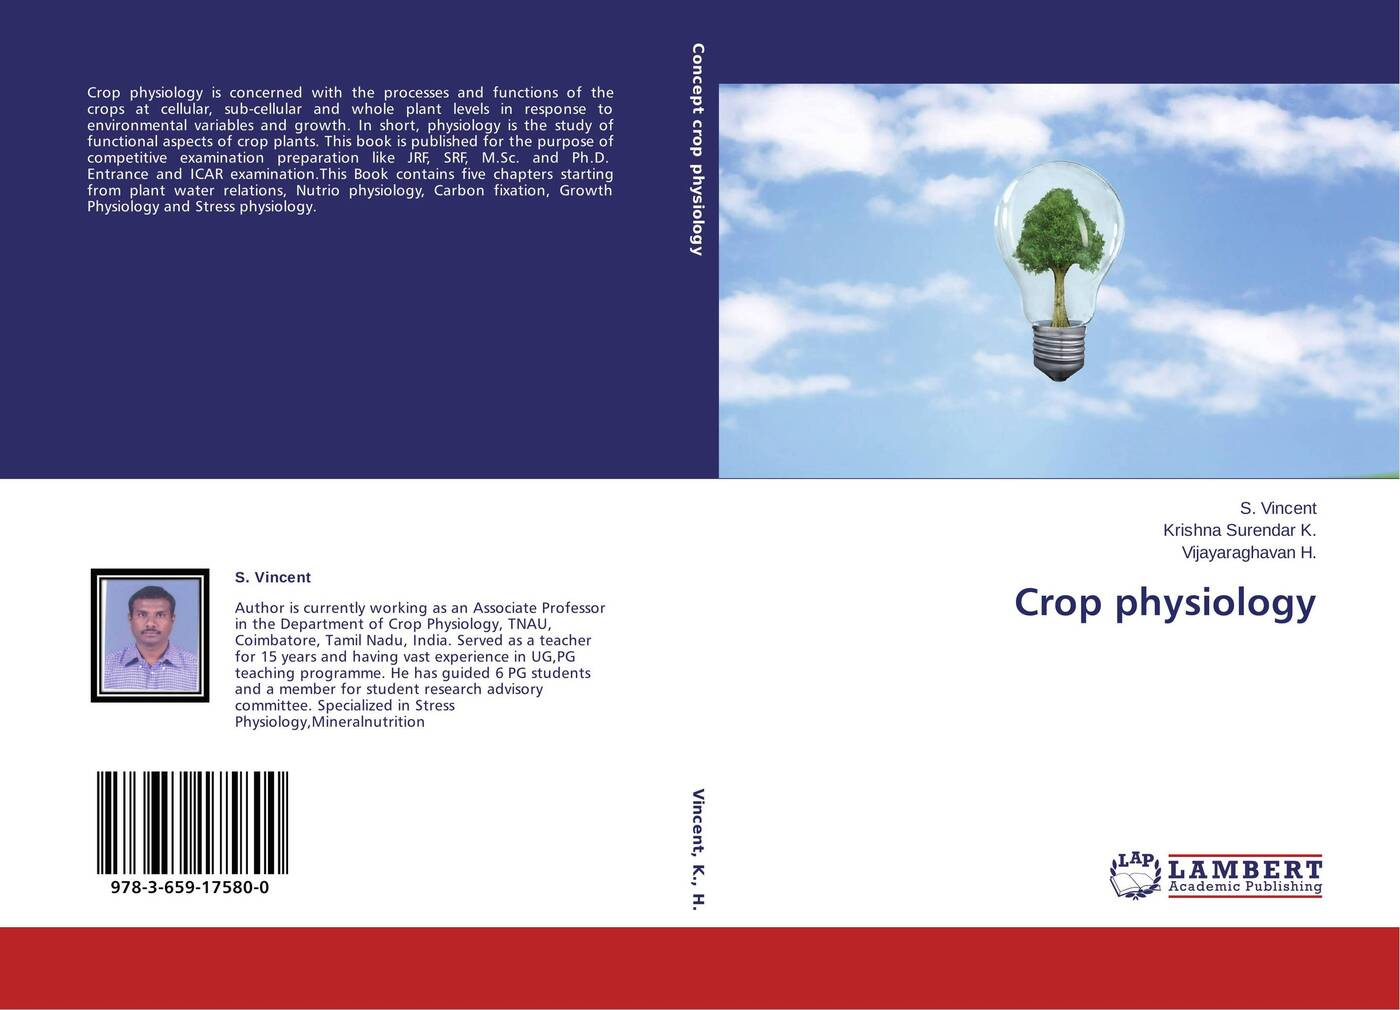 S. Vincent,Krishna Surendar K. and Vijayaraghavan H. Crop physiology preparation crop tee